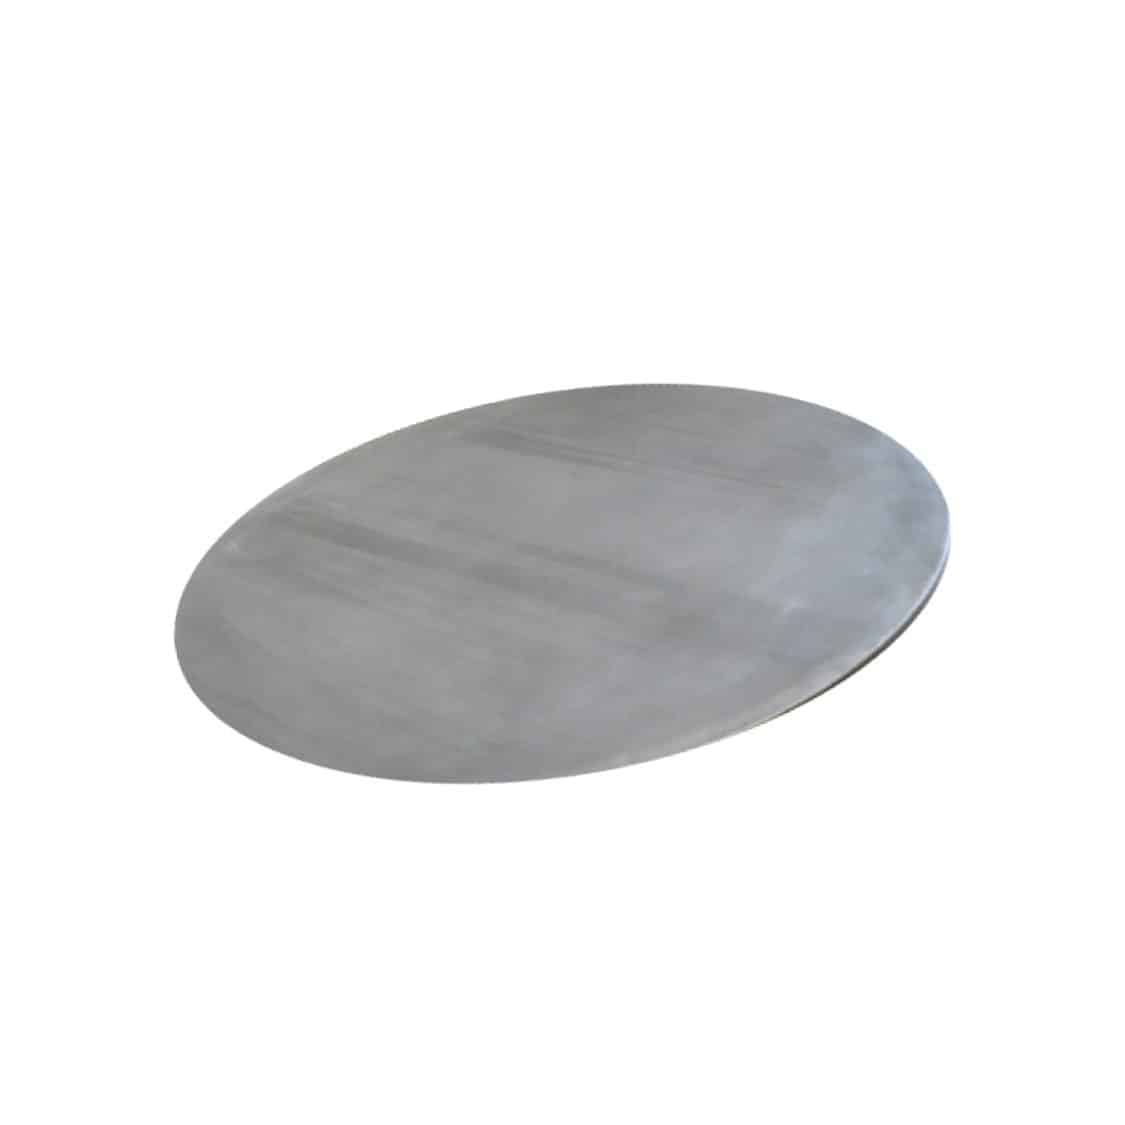 Zinc Tabletops | Metal & Industrial Tables | DeFrae Contract Furniture